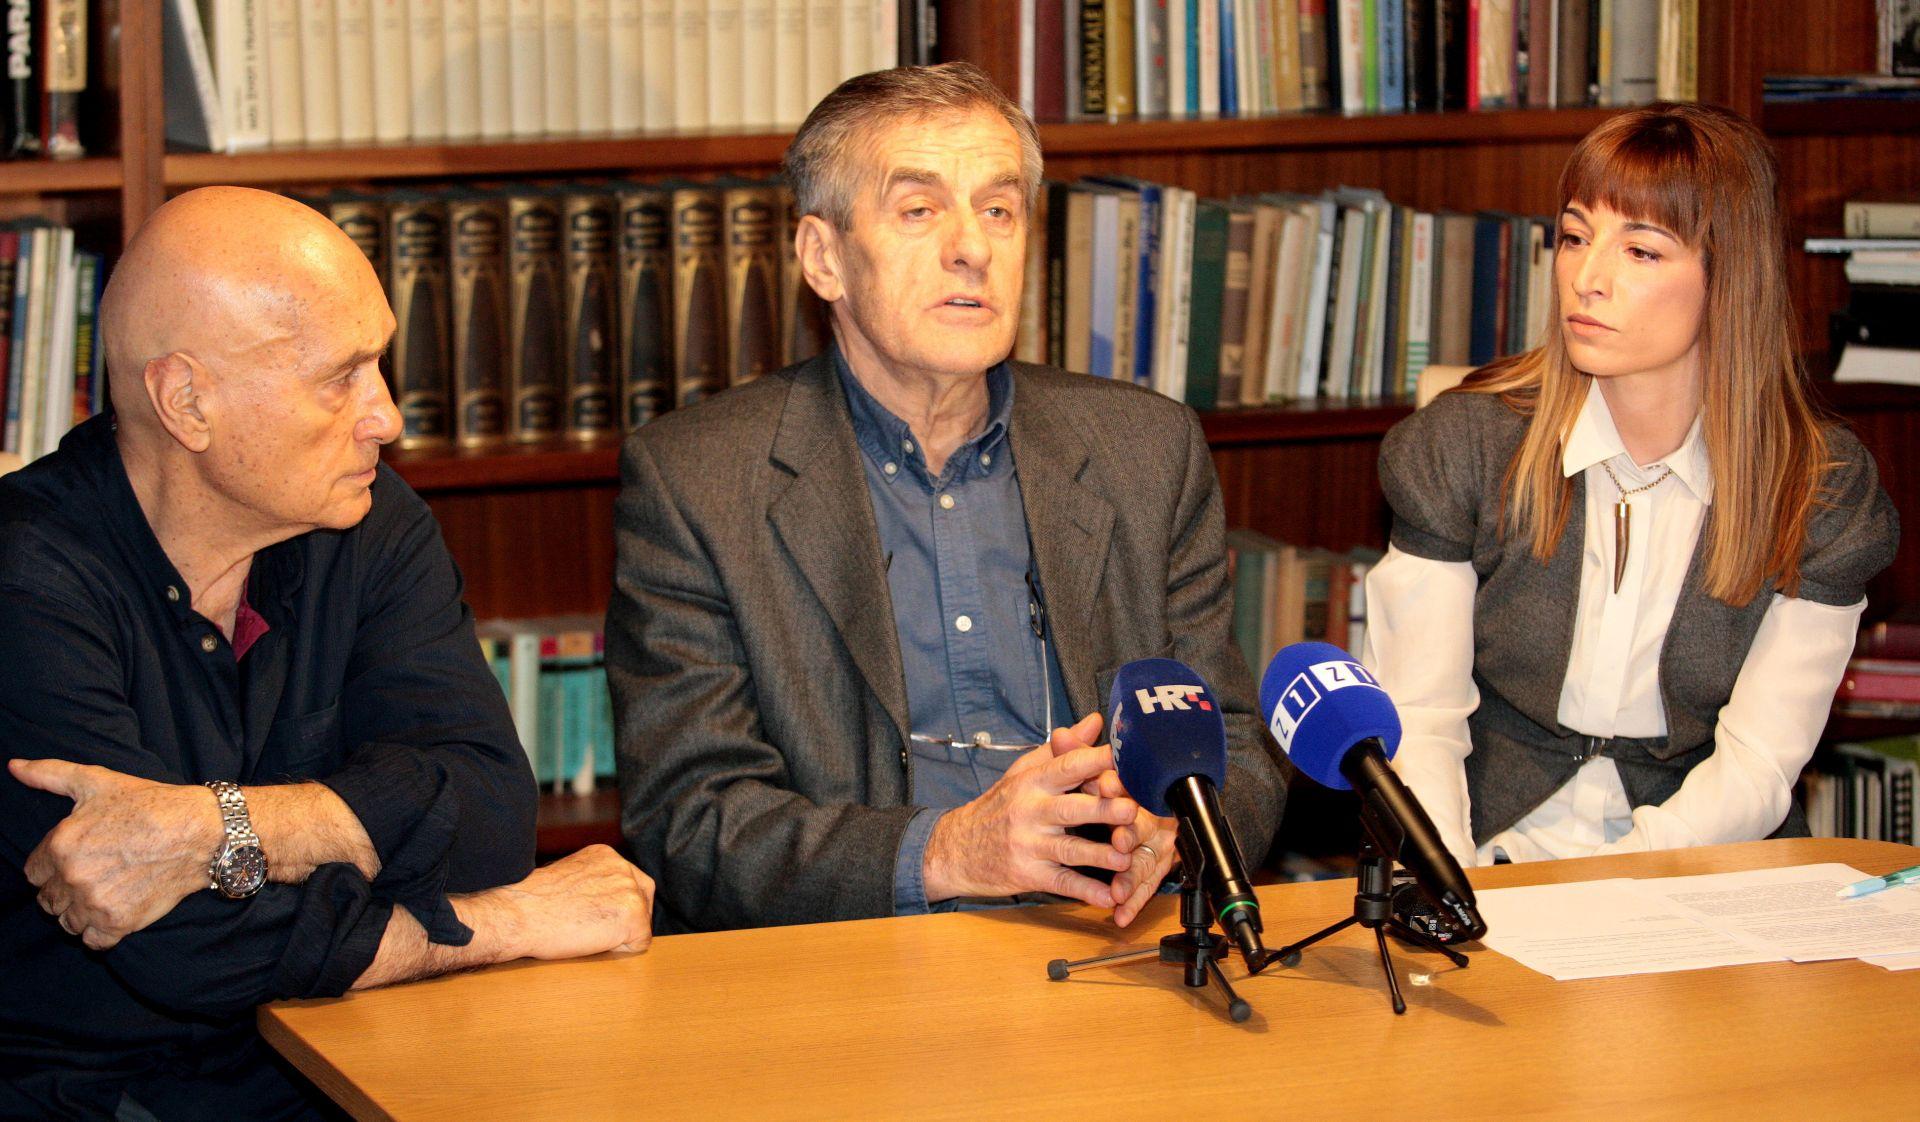 Jurčević tužbom osporava imenovanje glavnog ravnatelja HRT-a